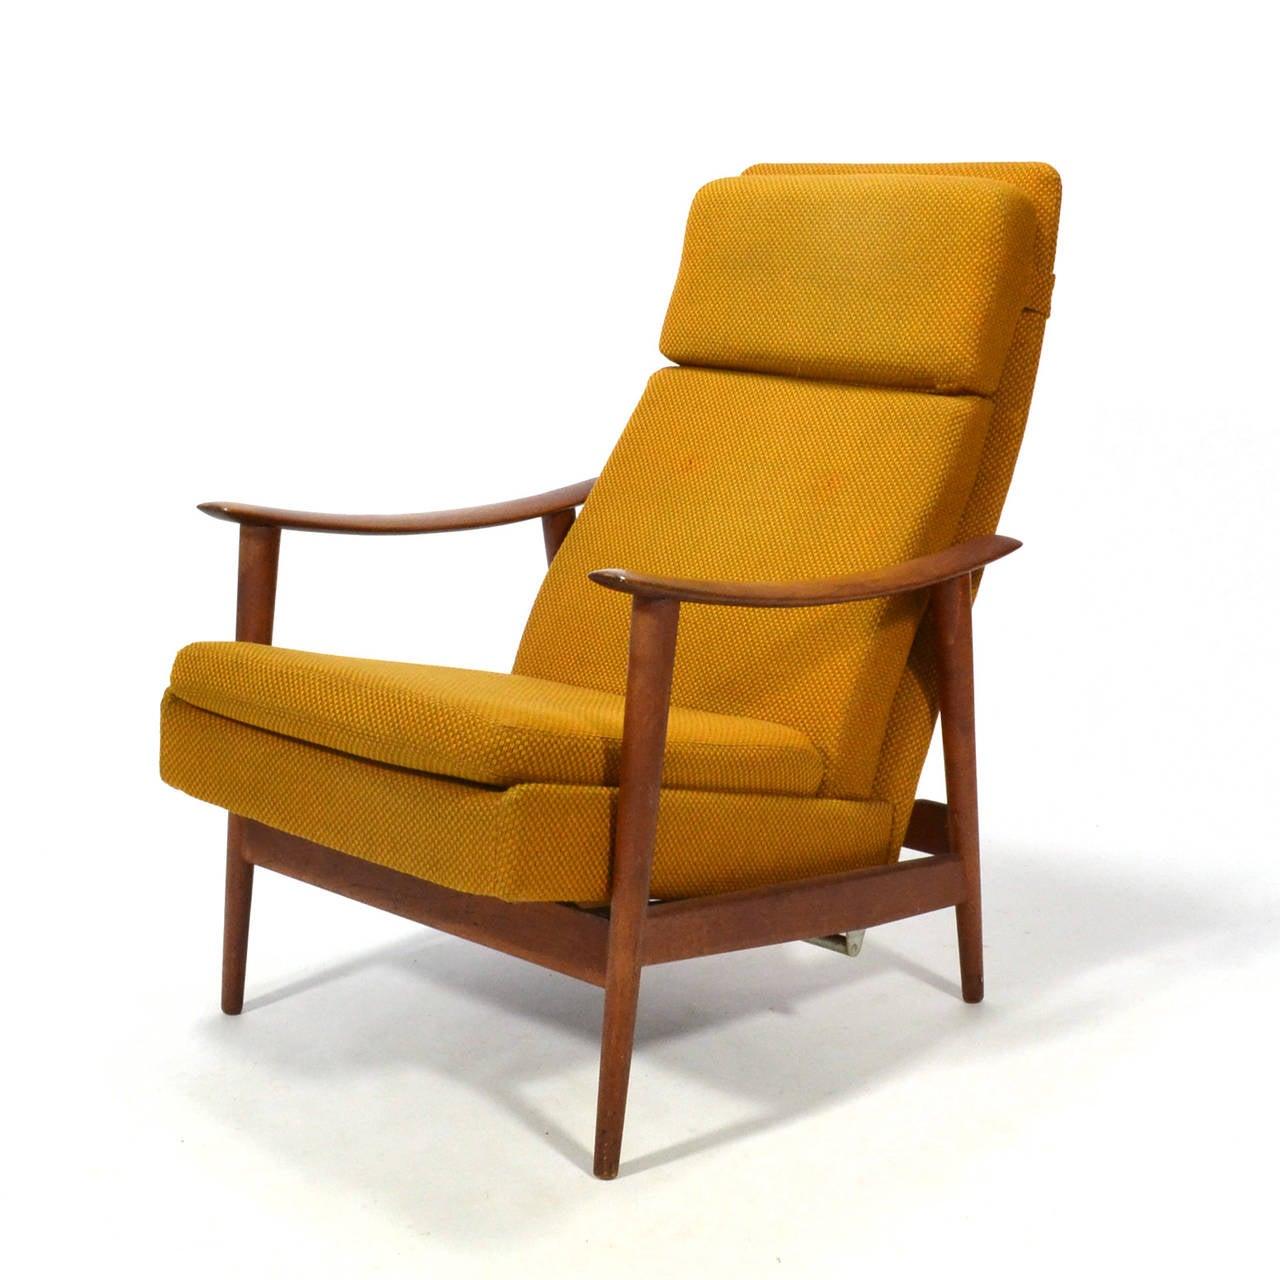 Danish Teak Reclining Lounge Chair at 1stdibs